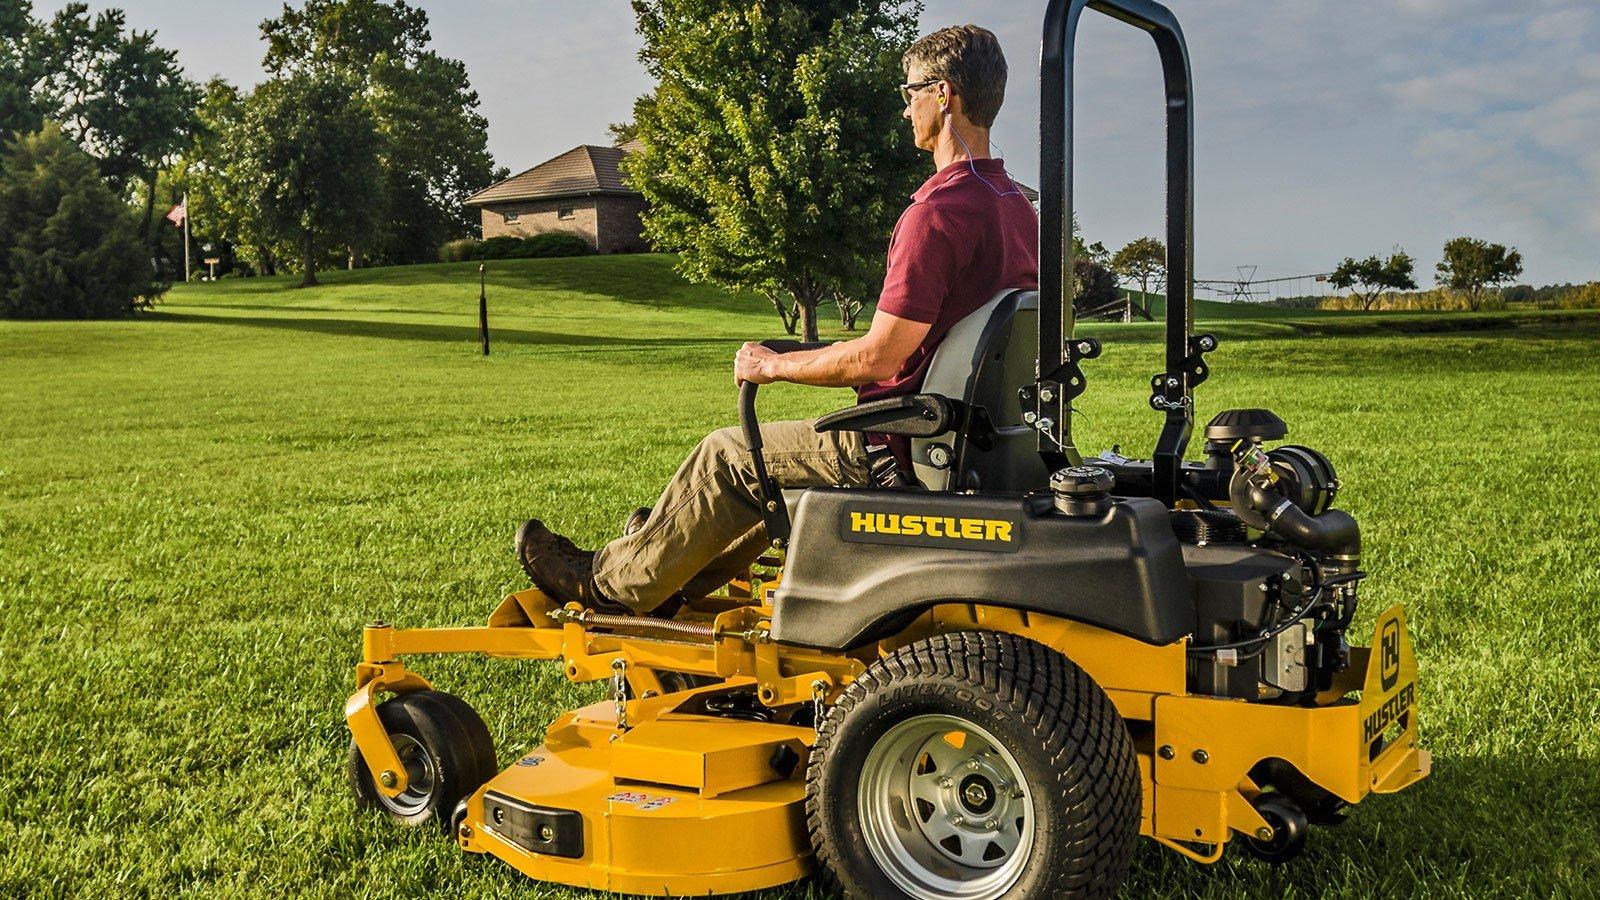 Very common hustler sport lawnmower activity